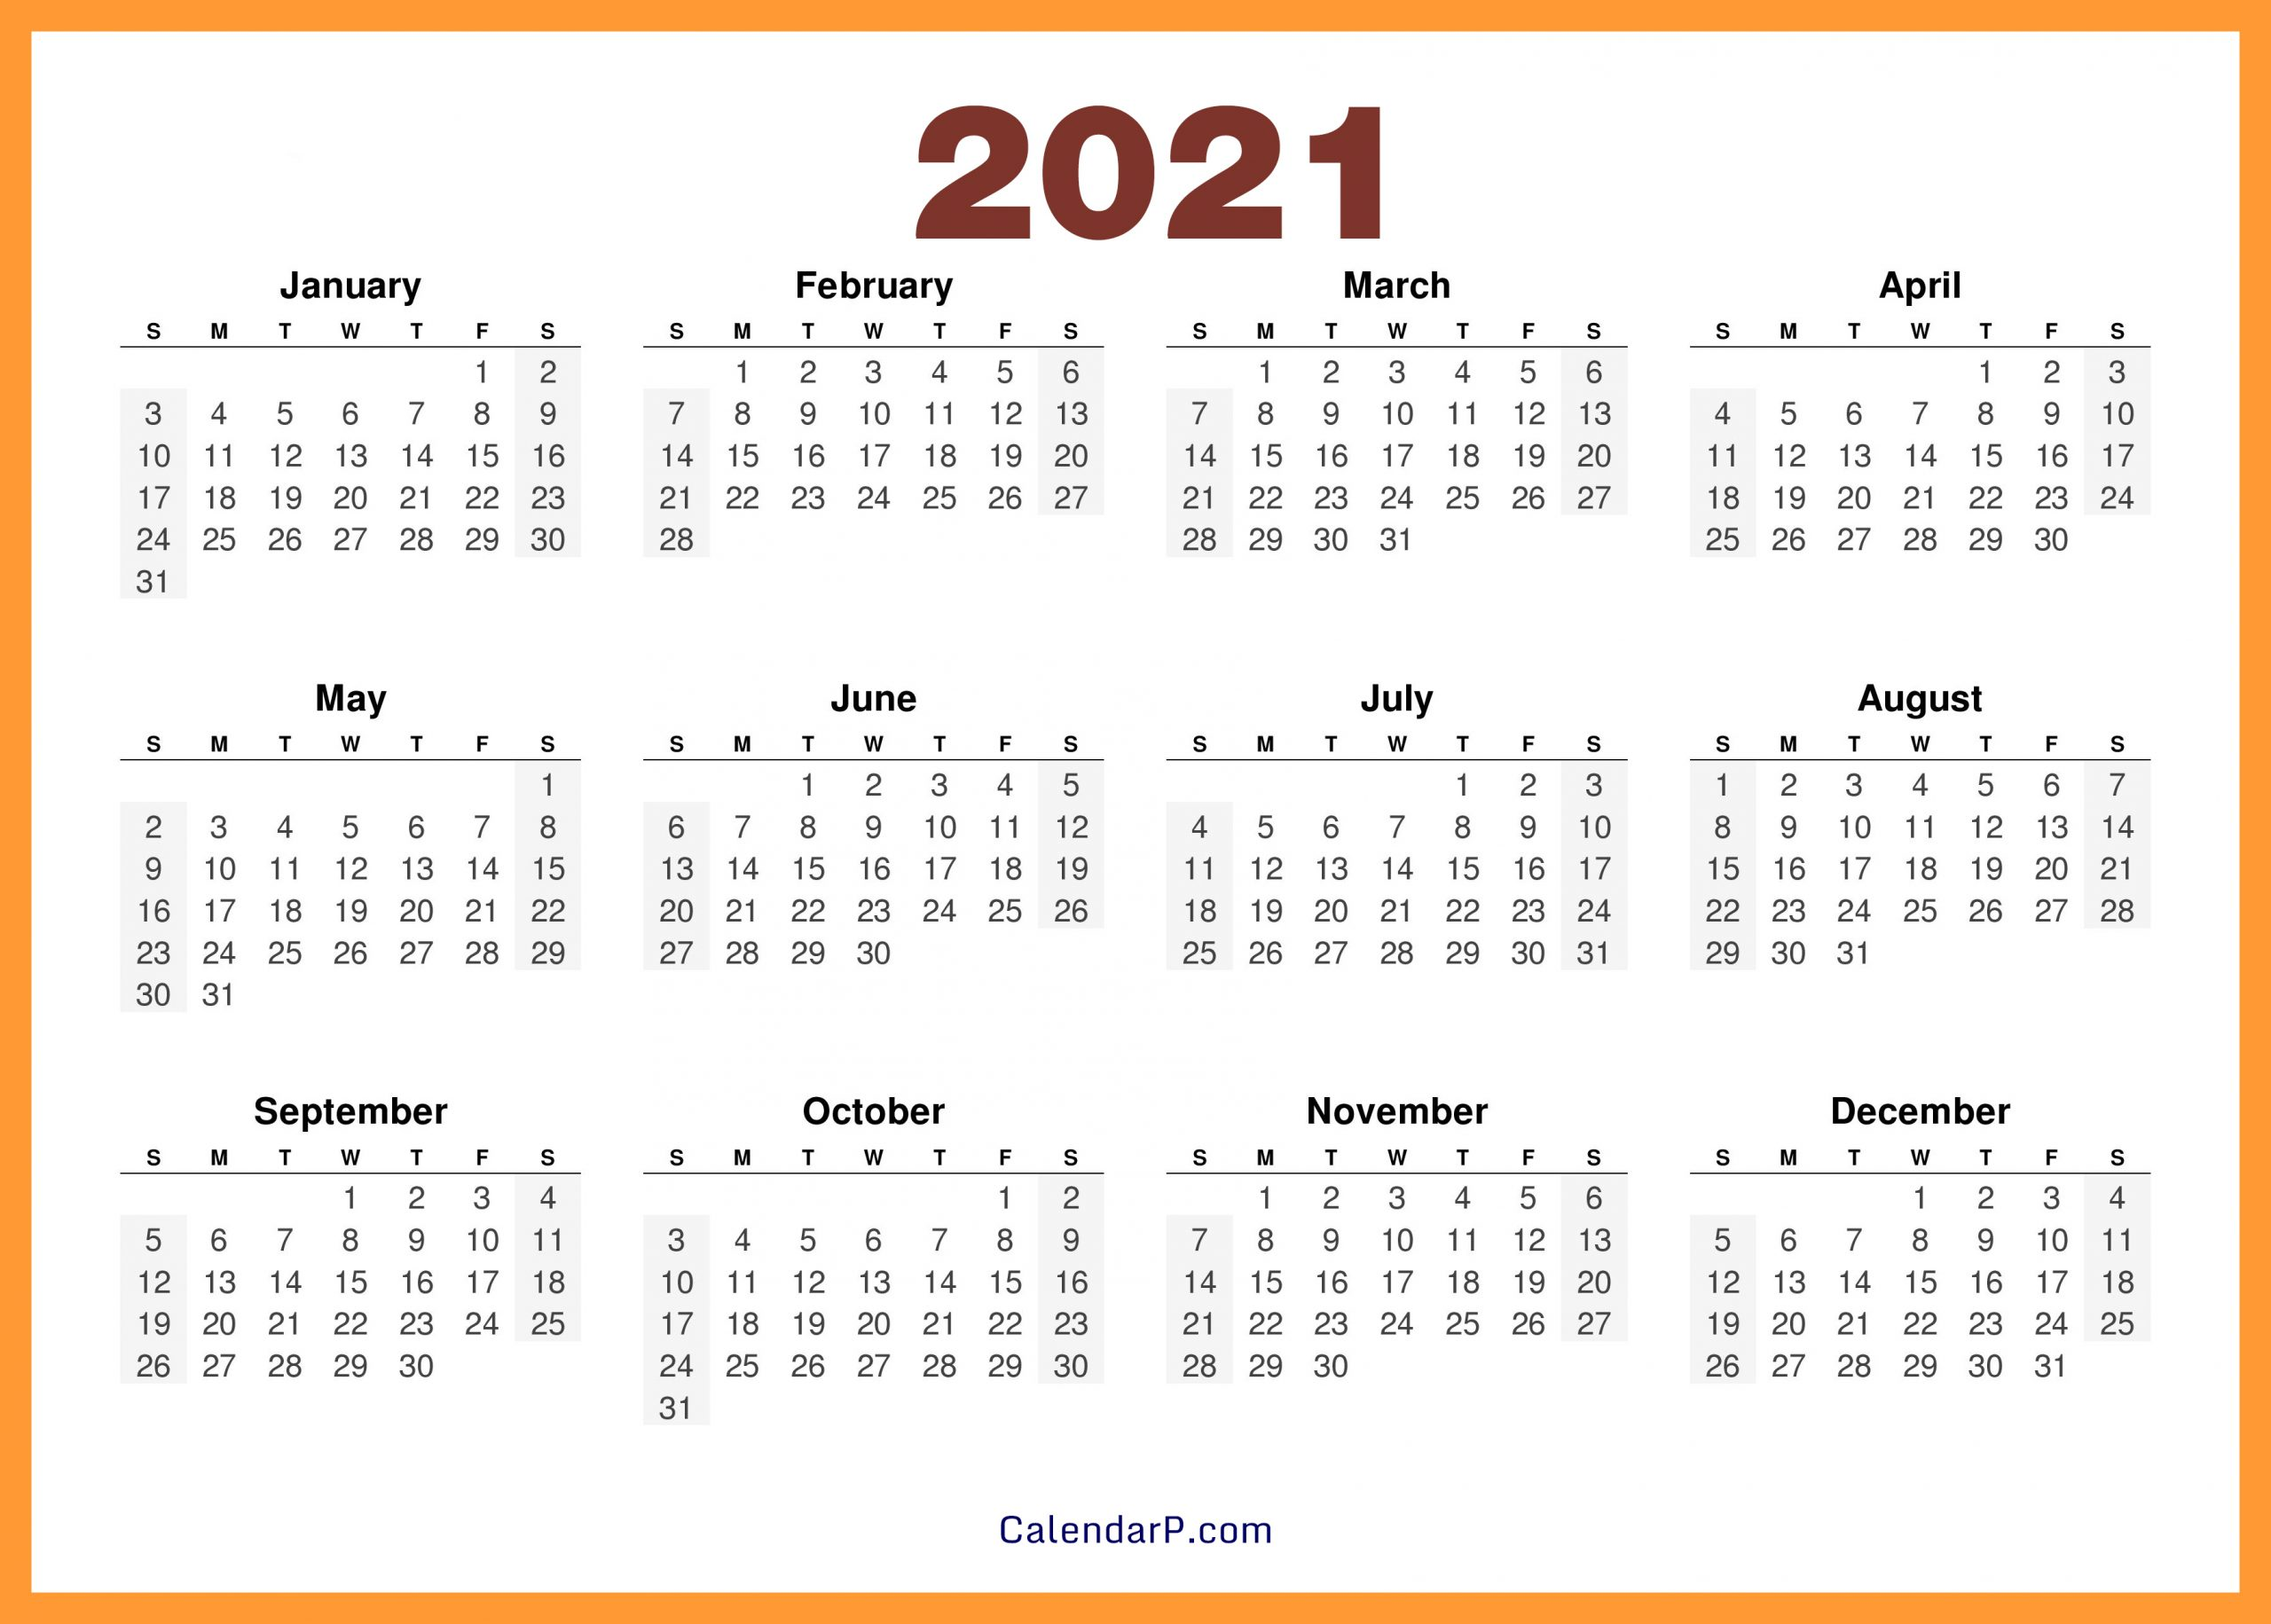 2021 Calendar Printable Free, Hd - Orange - Calendarp